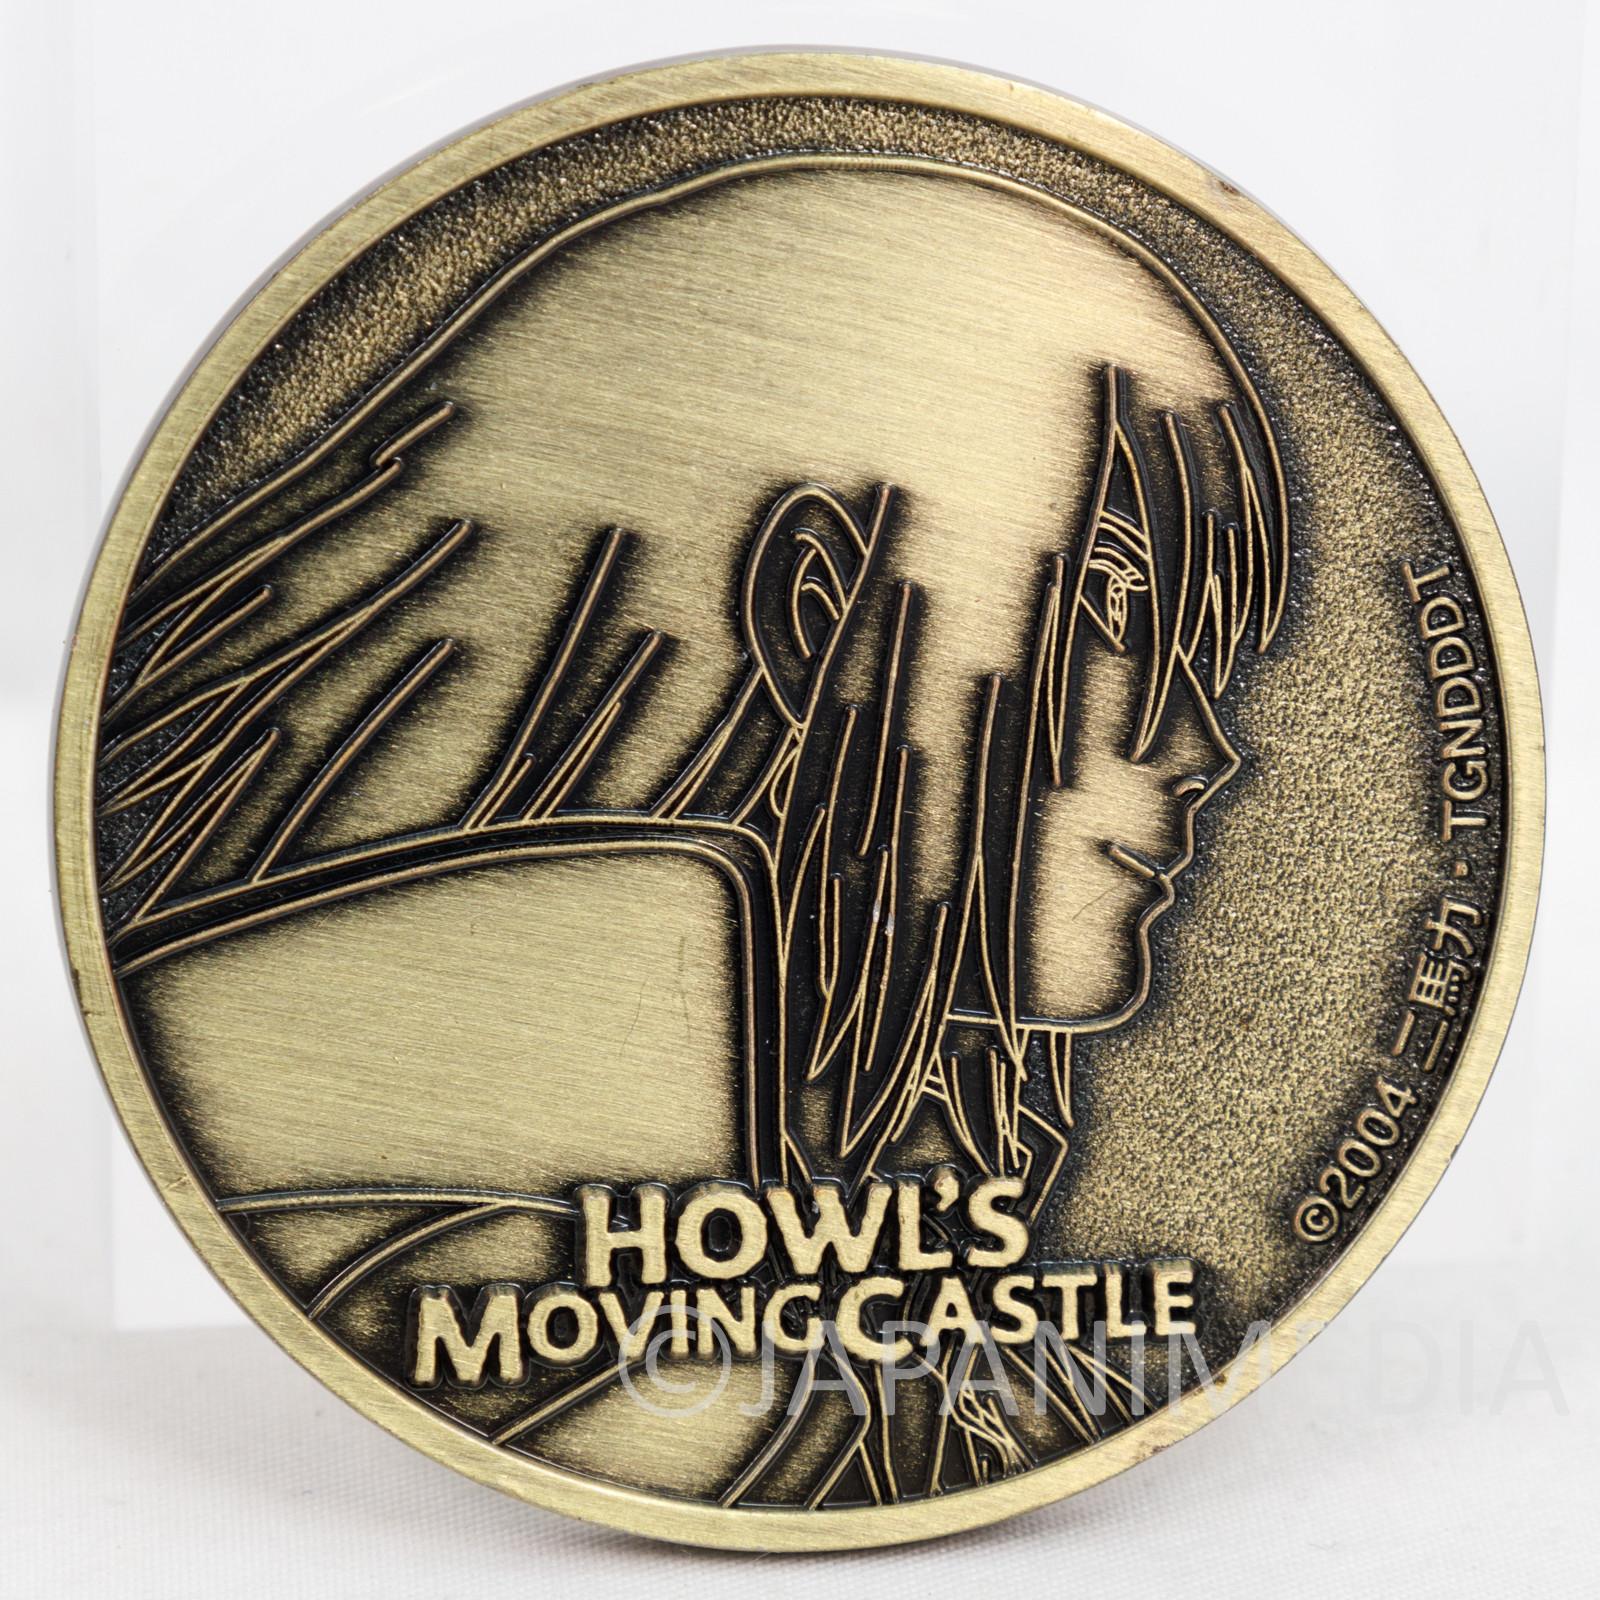 Howl's Moving Castle Relief Medal 2004 Ghibli Hayao Miyazaki JAPAN ANIME MANGA